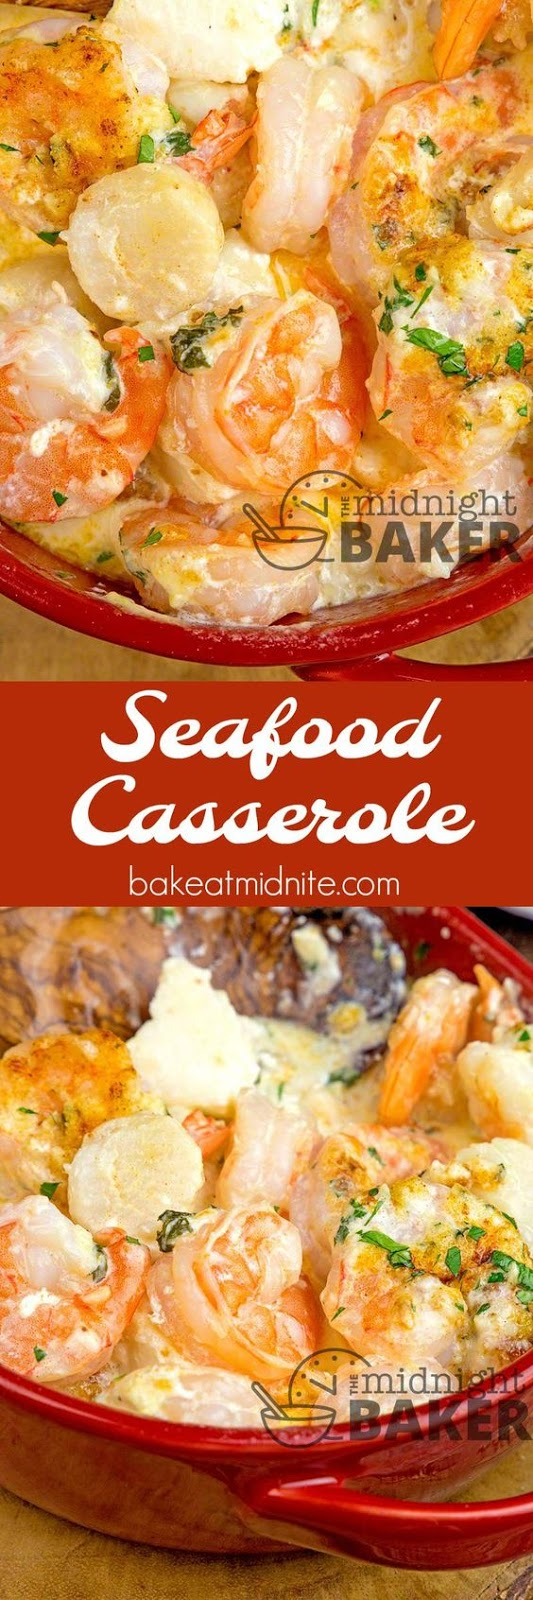 SEAFOOD CASSEROLE - Holiday Recipes